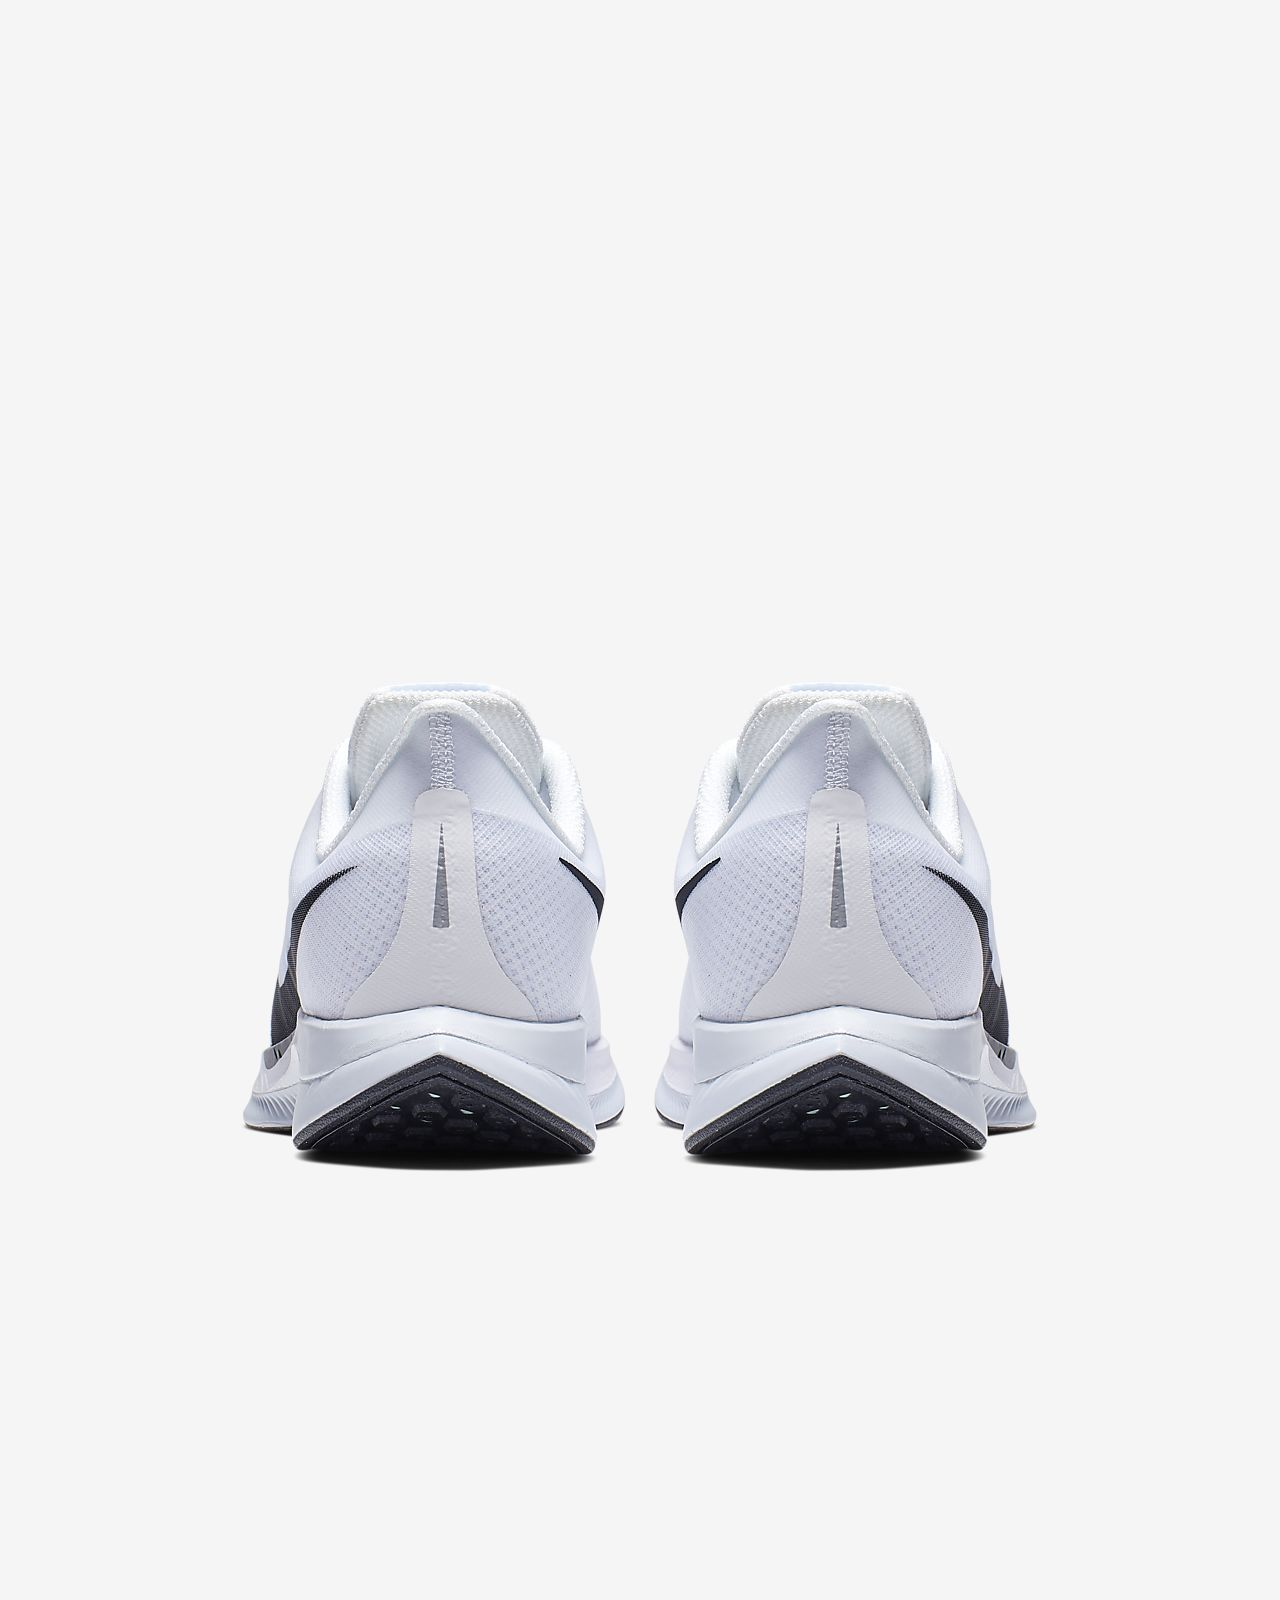 9be2439ab8c0c Nike Zoom Pegasus Turbo Women s Running Shoe. Nike.com CA